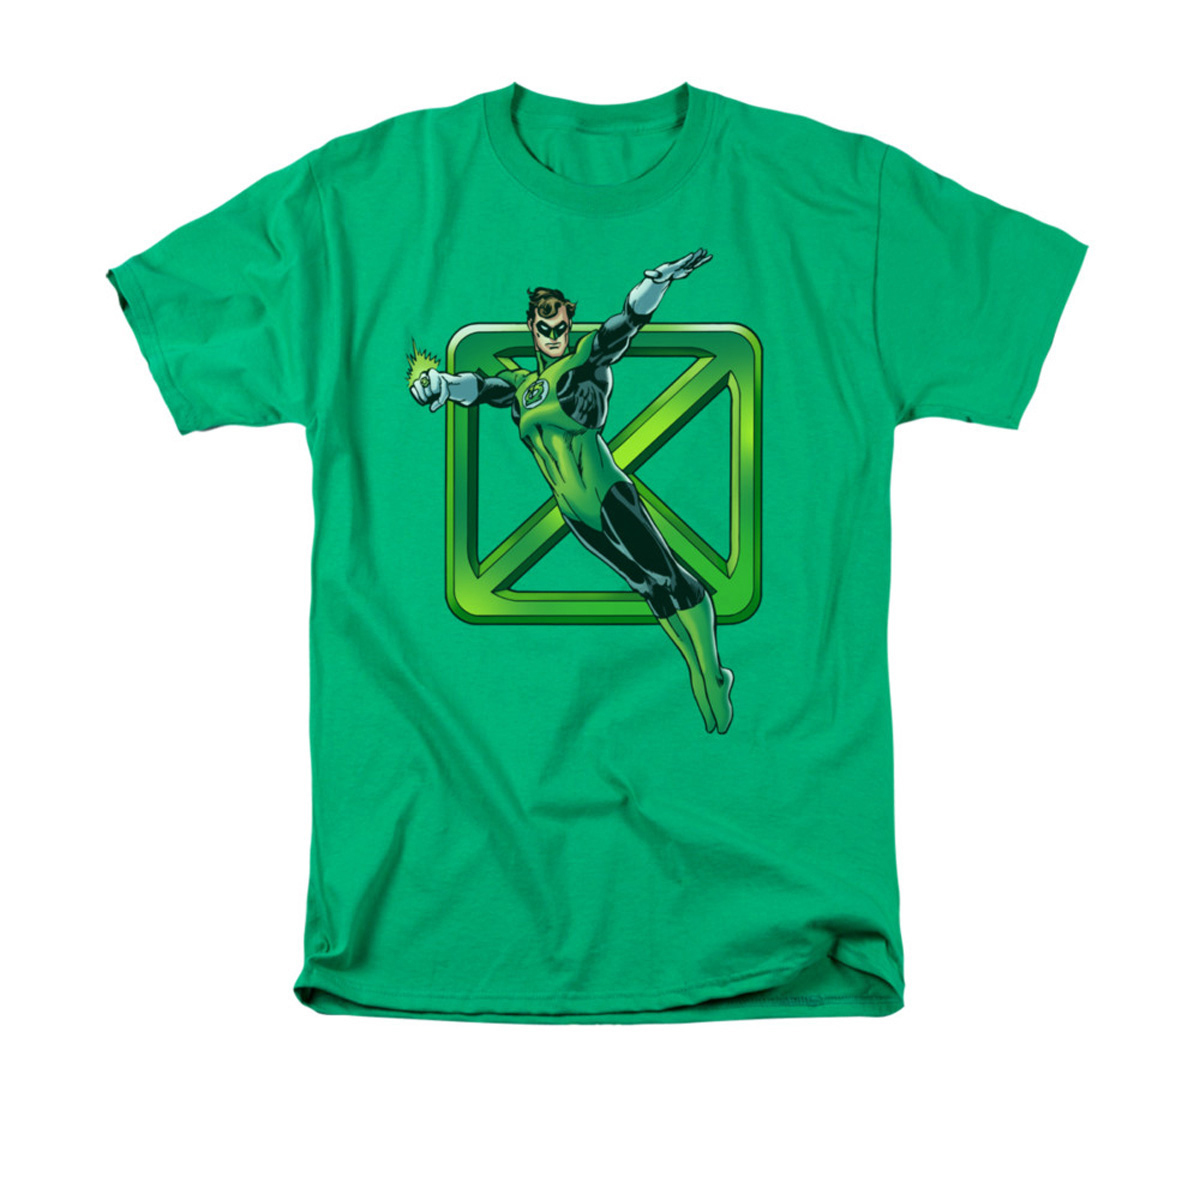 Sheldon's Green Cross T-shirt - Size: Large 2870-824629-L-GRN